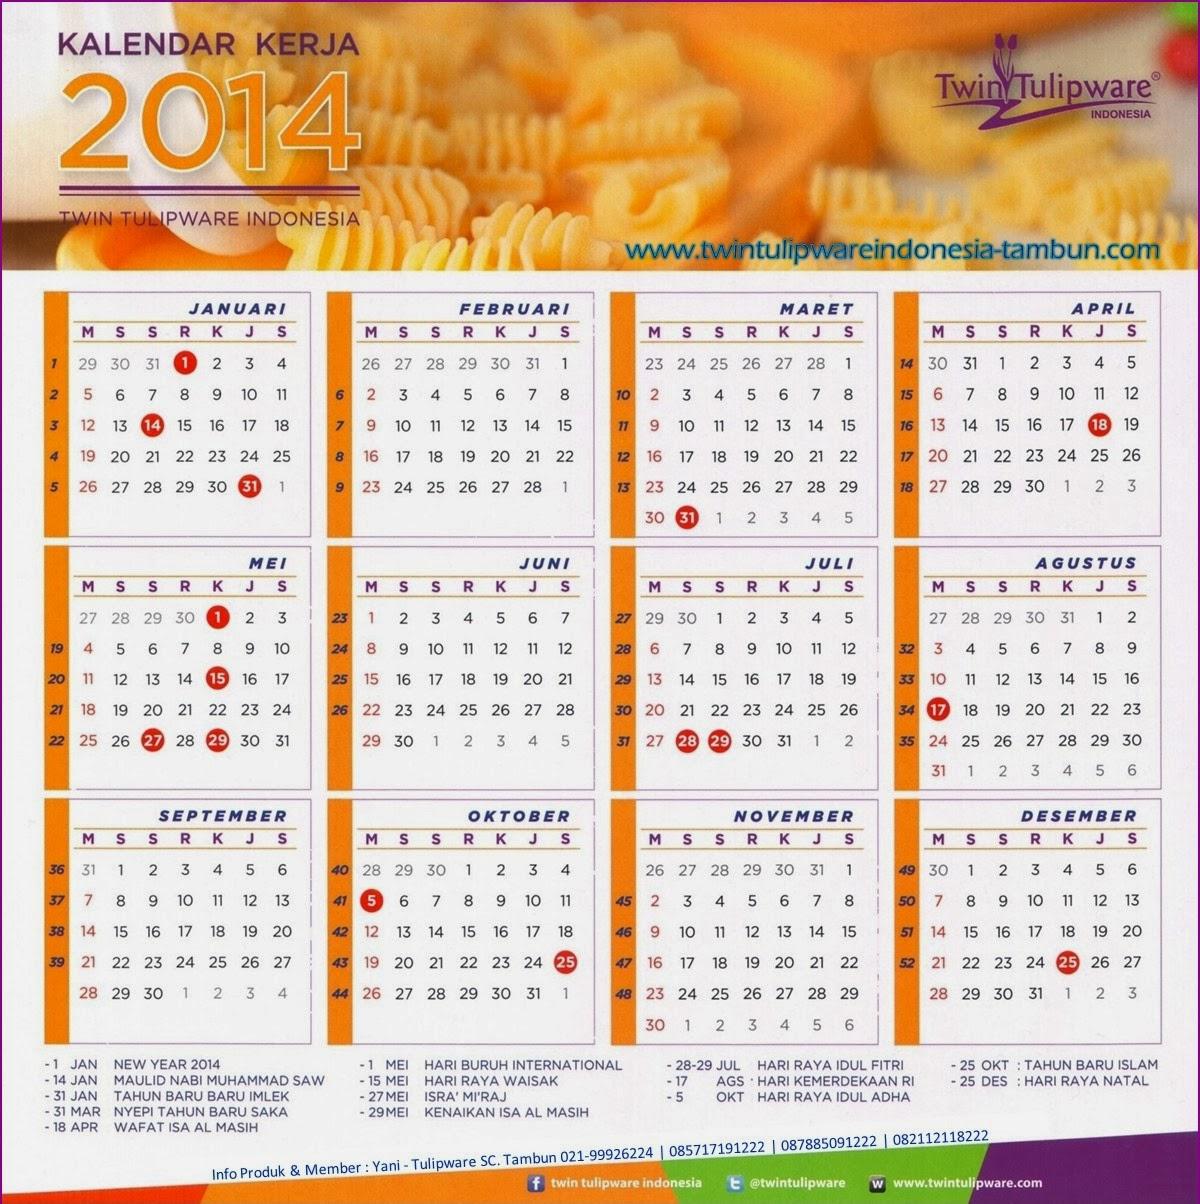 Kalender Kerja Twin Tulipware 2014